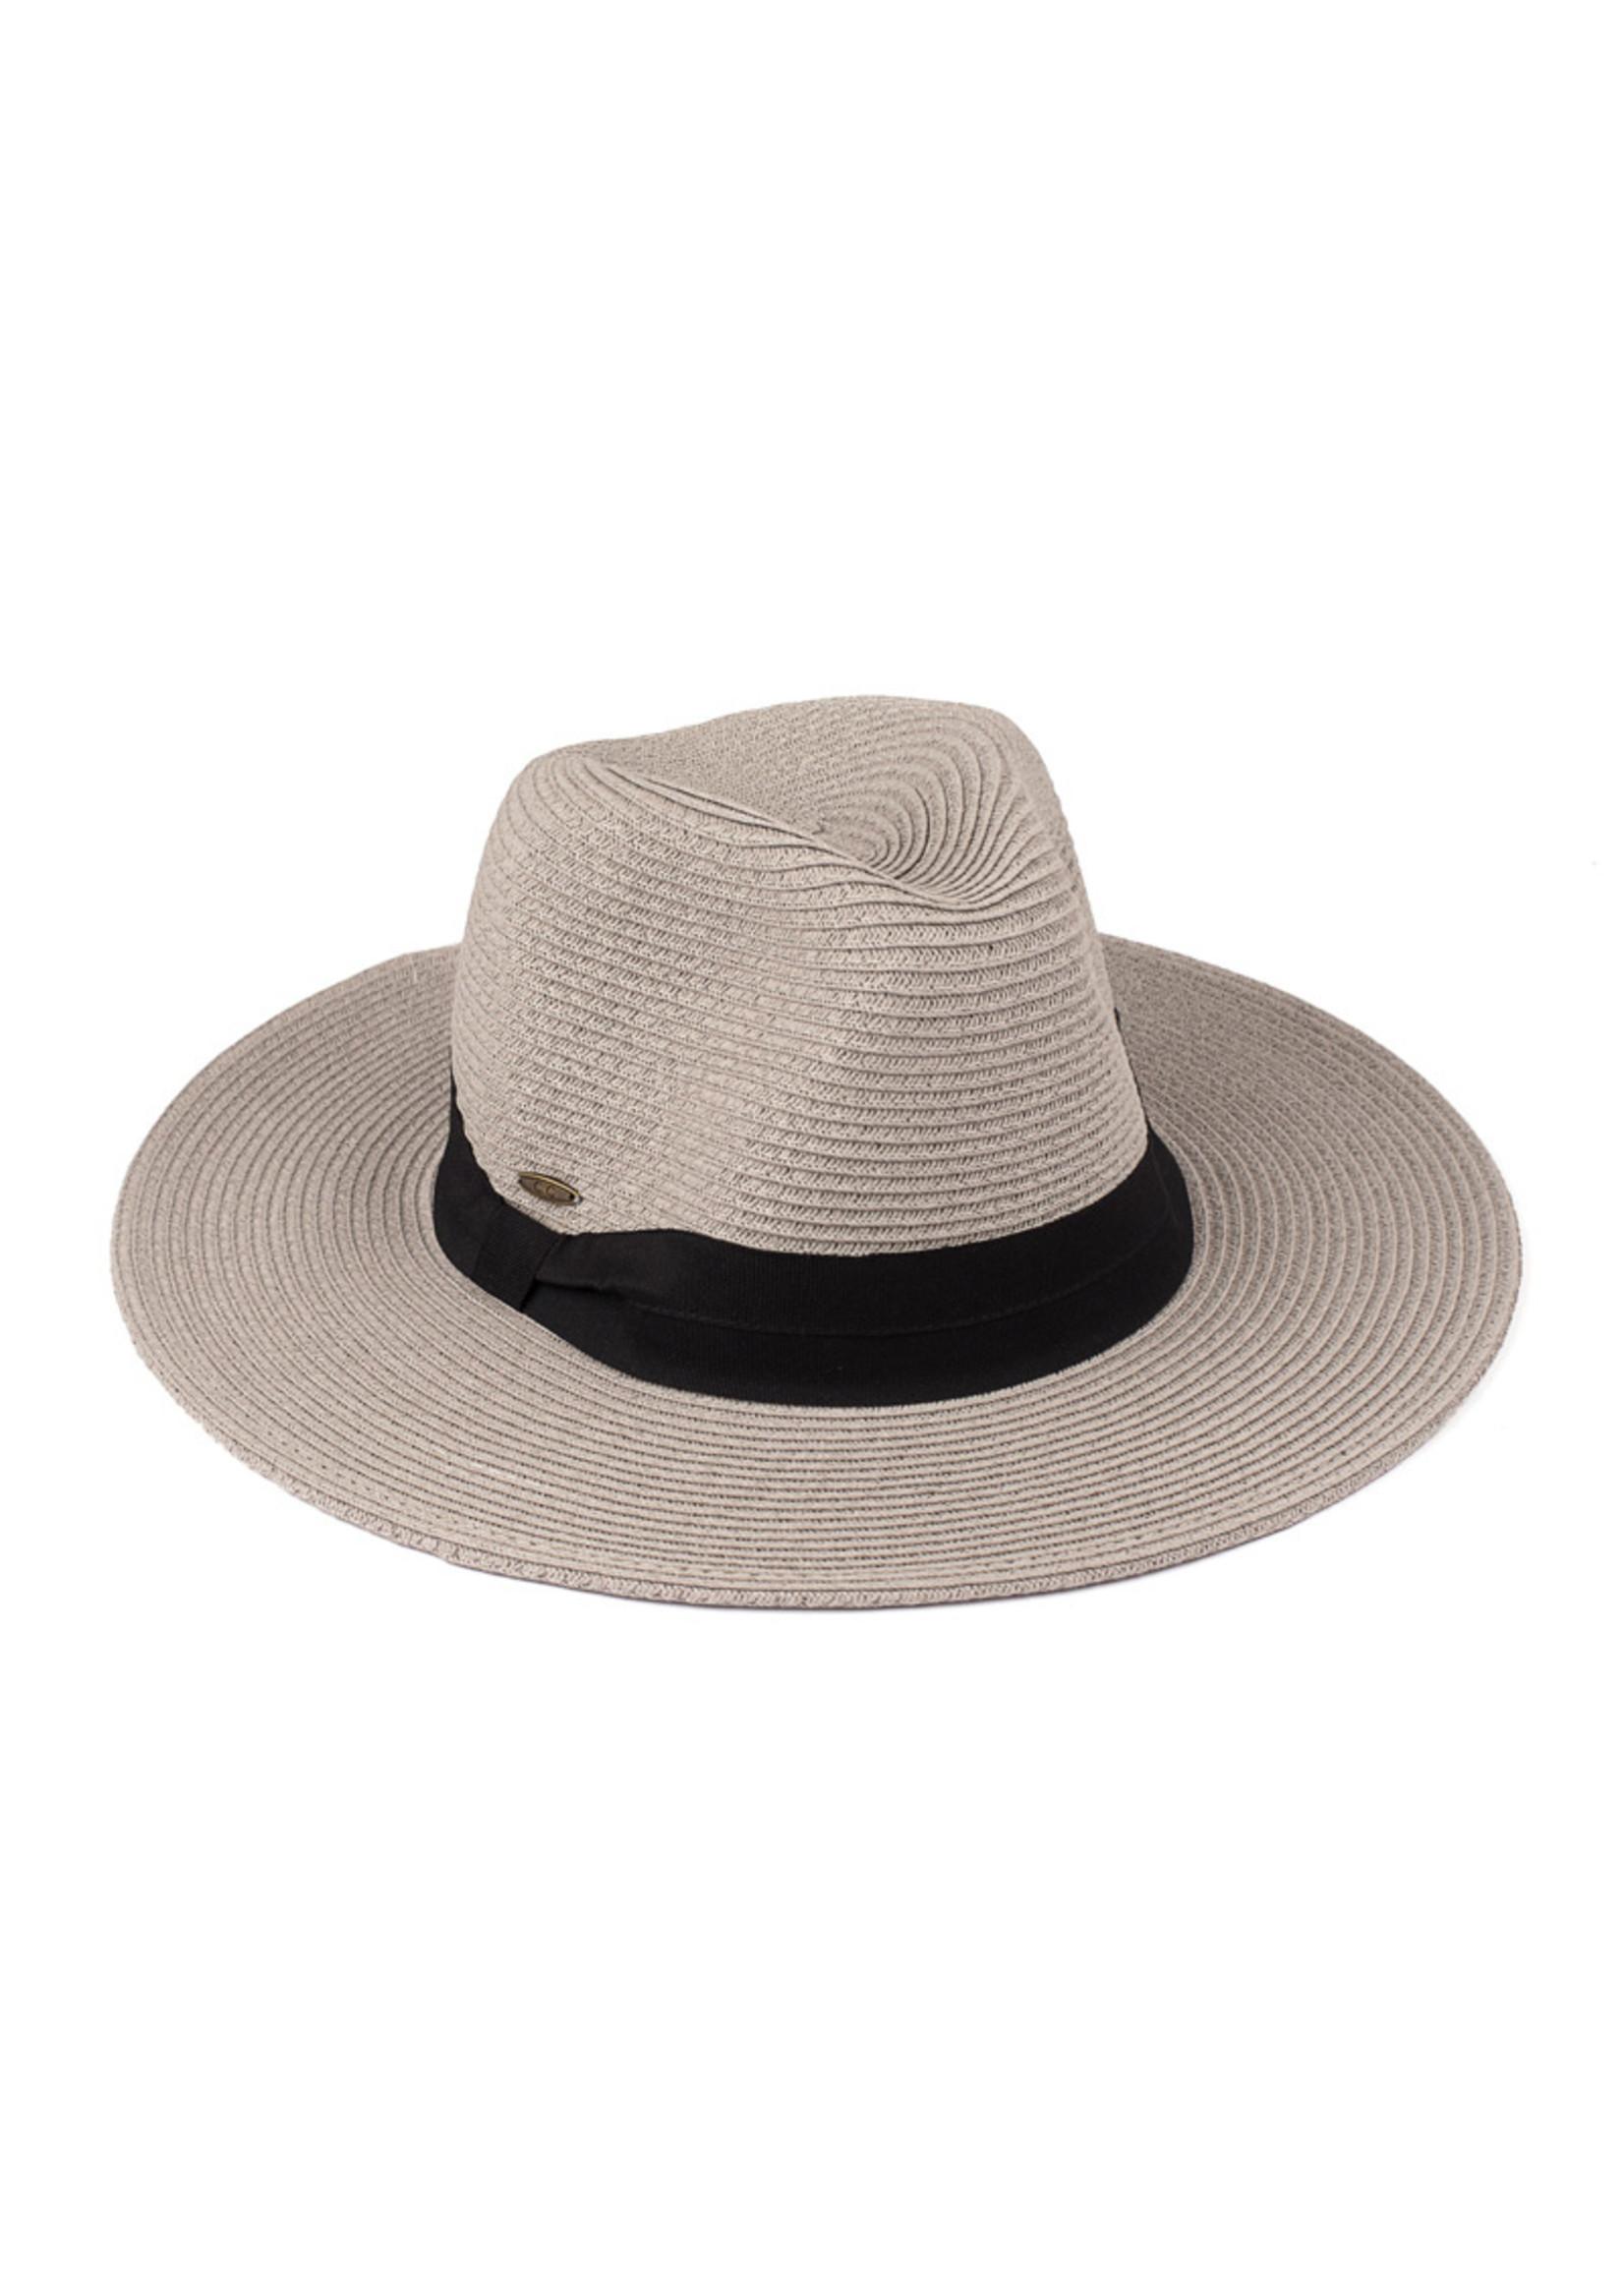 Braid Fedora Hat